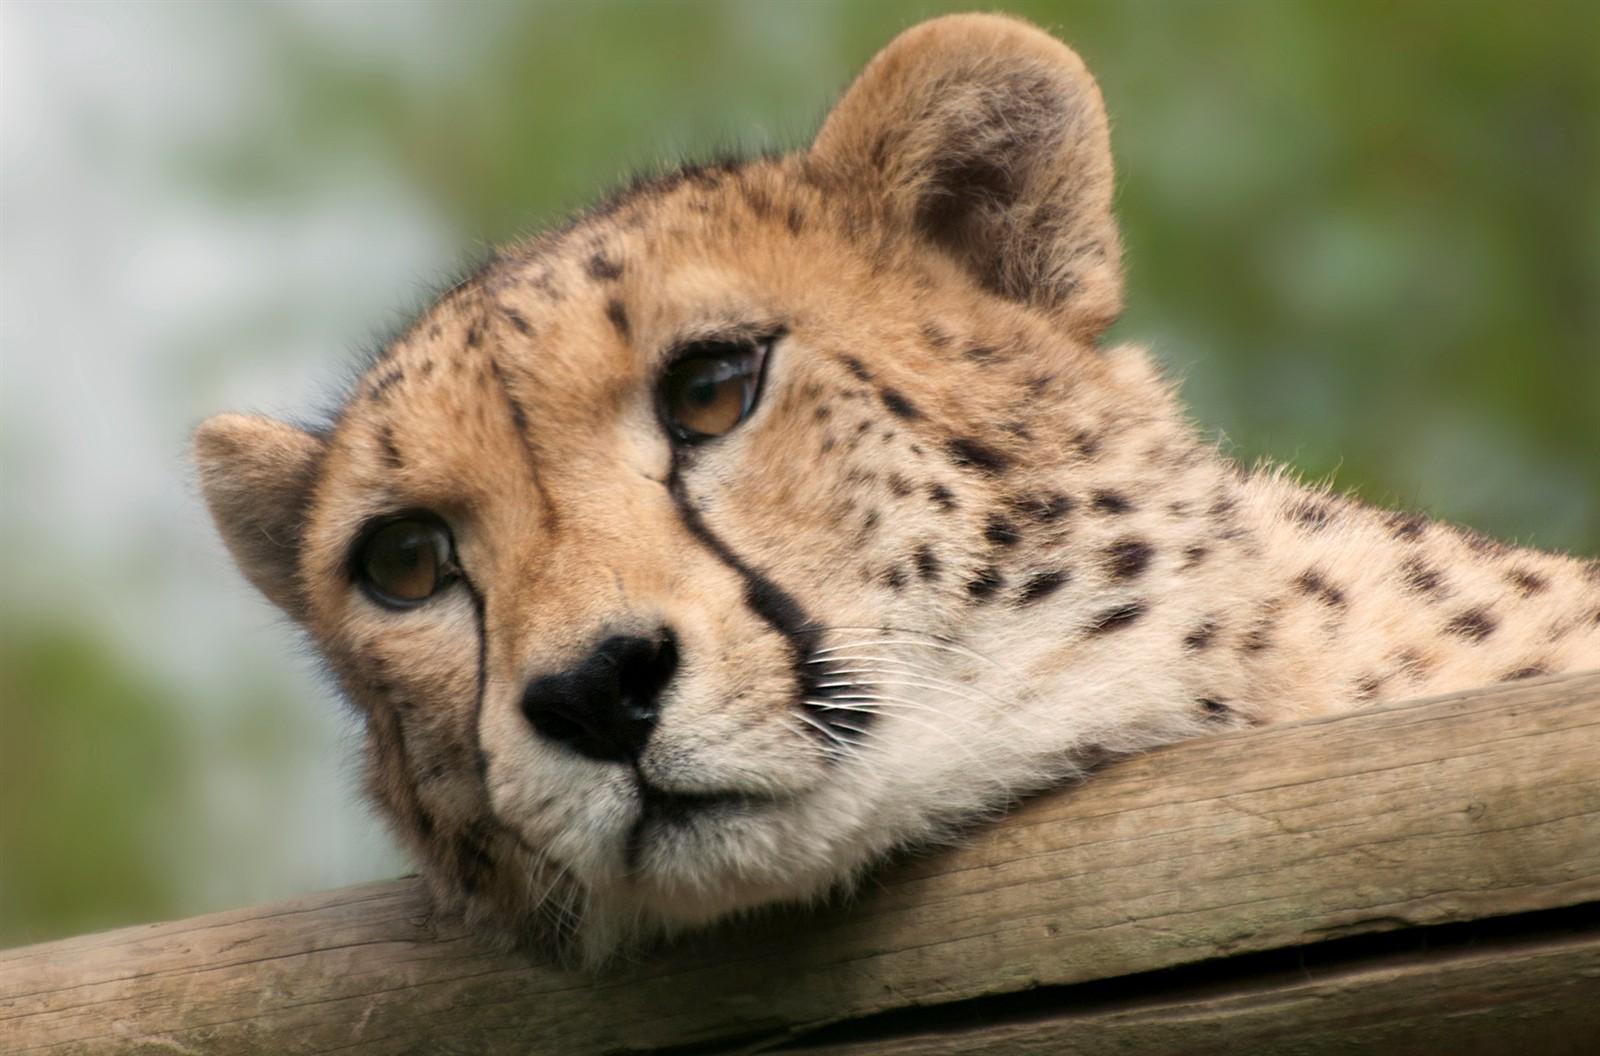 cute baby cheetahs wallpapers